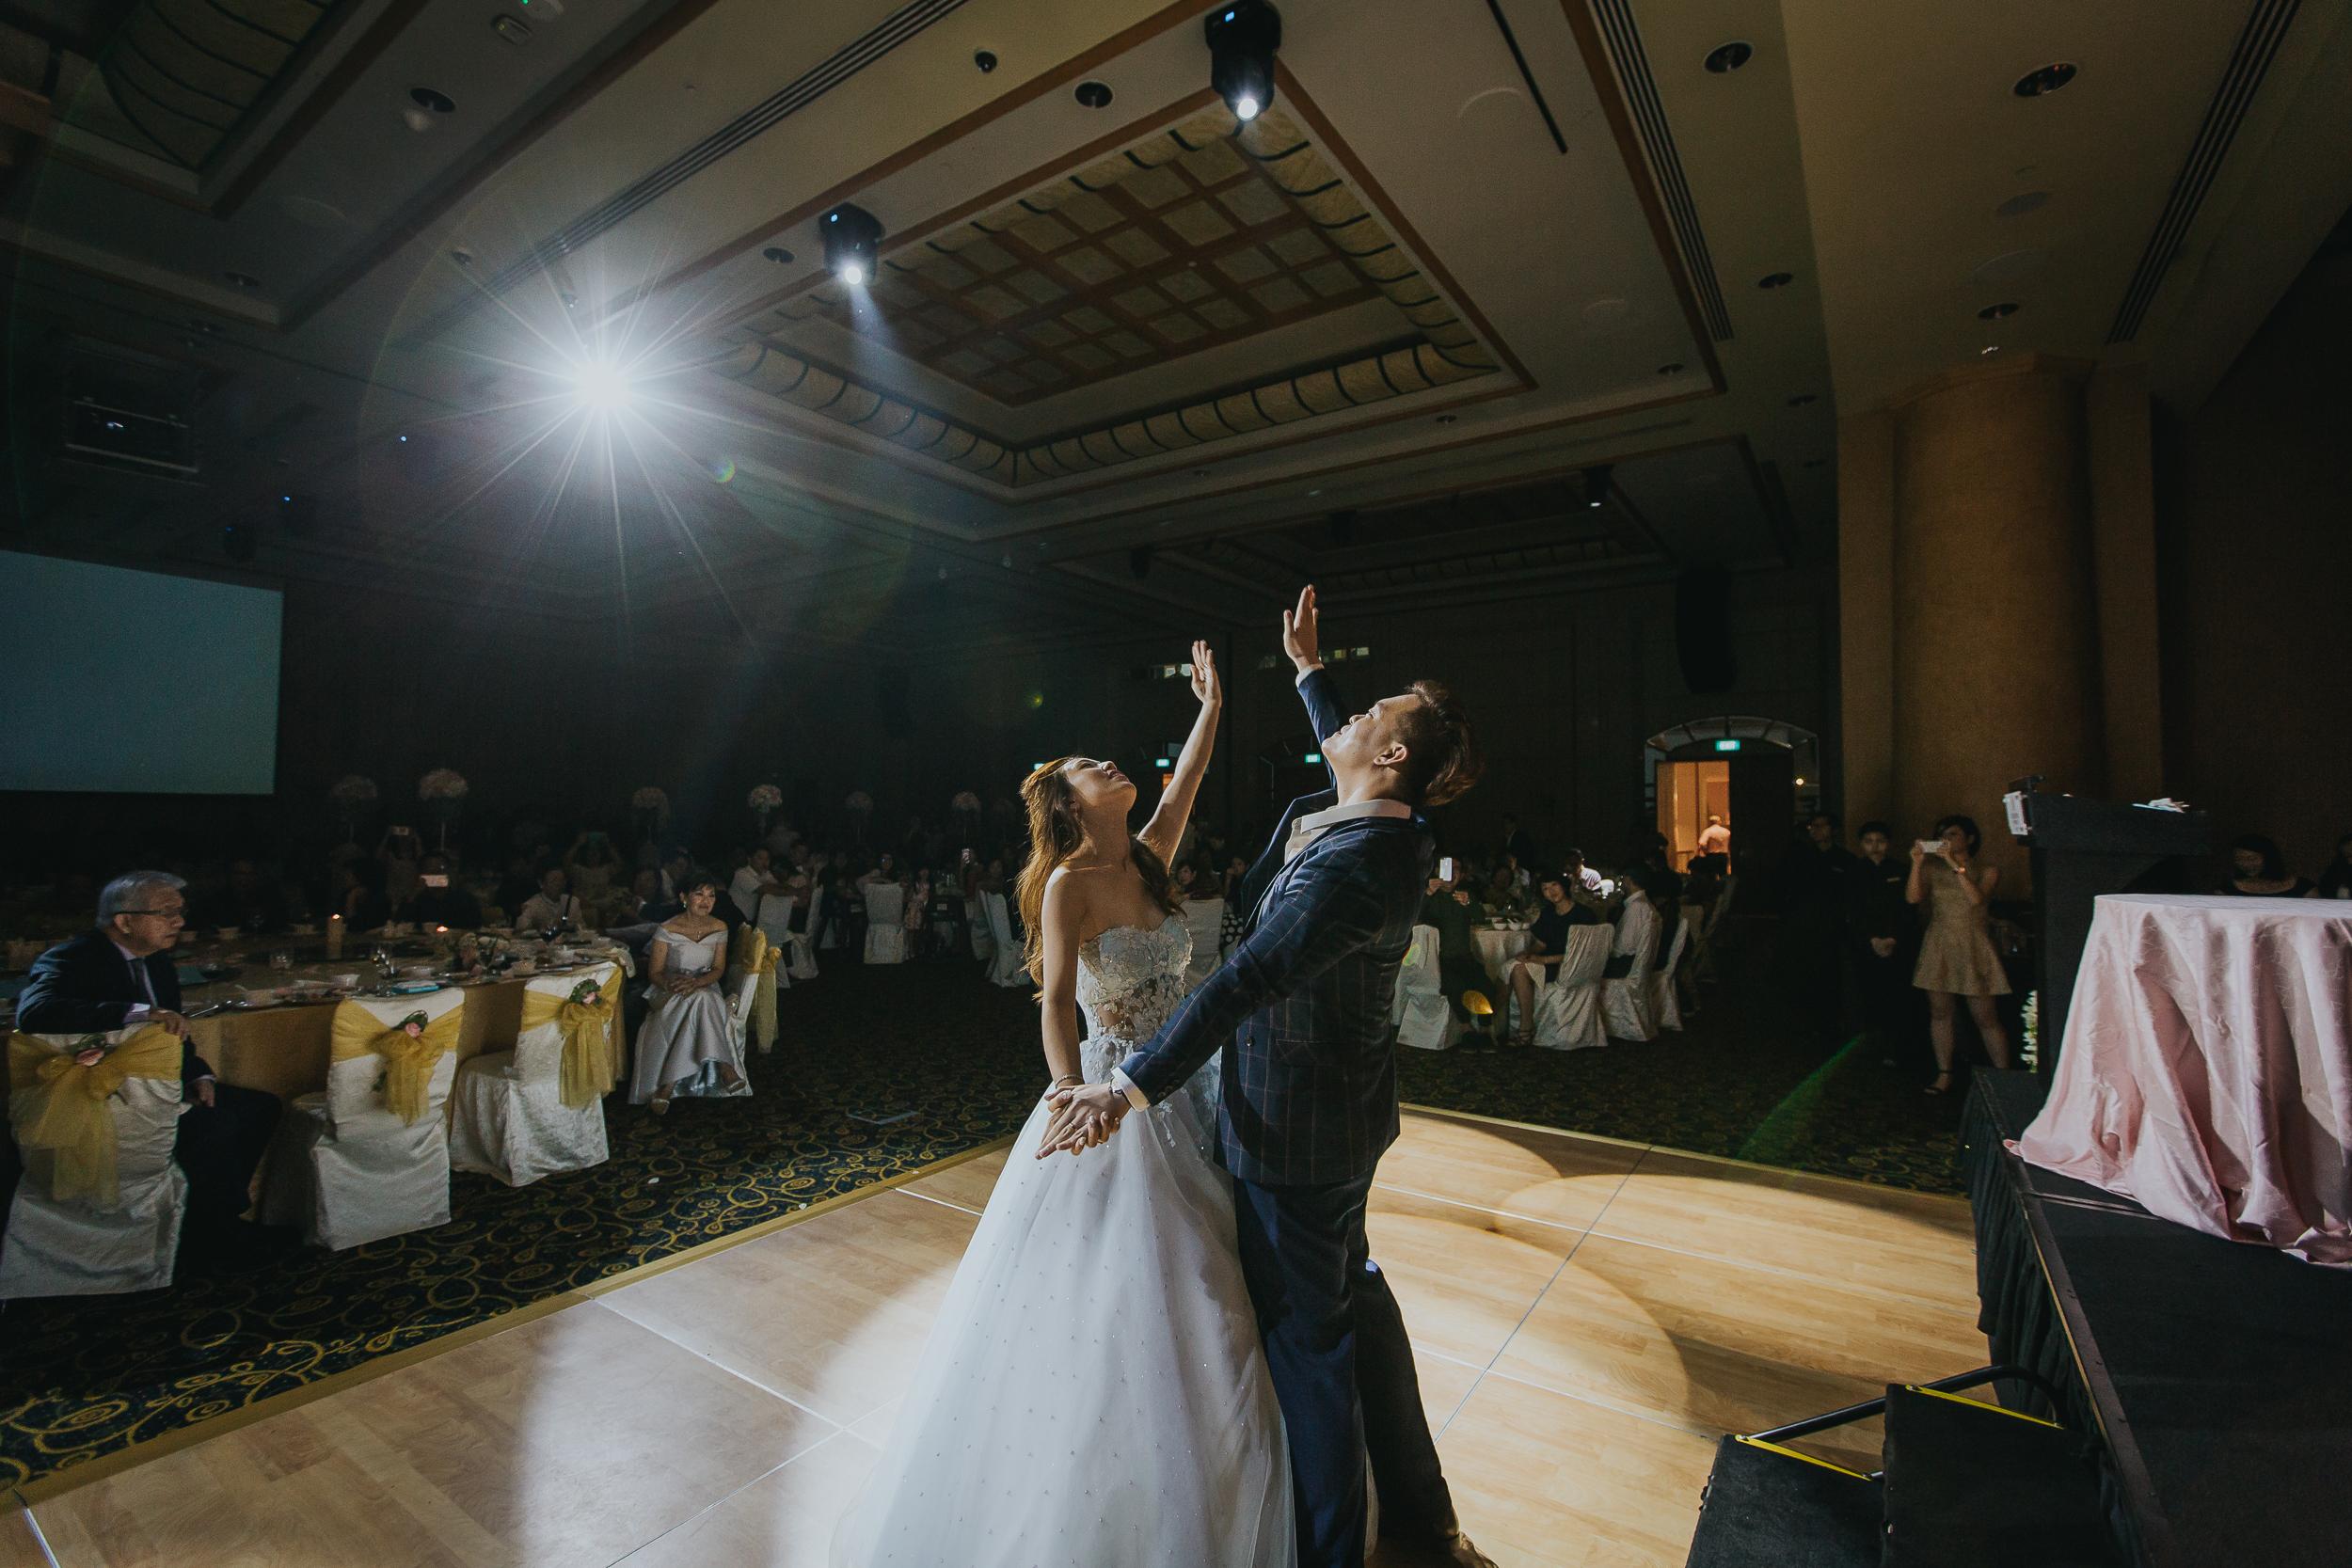 Singapore+Actual+Day+Wedding+Photographer+Grand+Mercure+Oliver+Estelle-0119.jpg